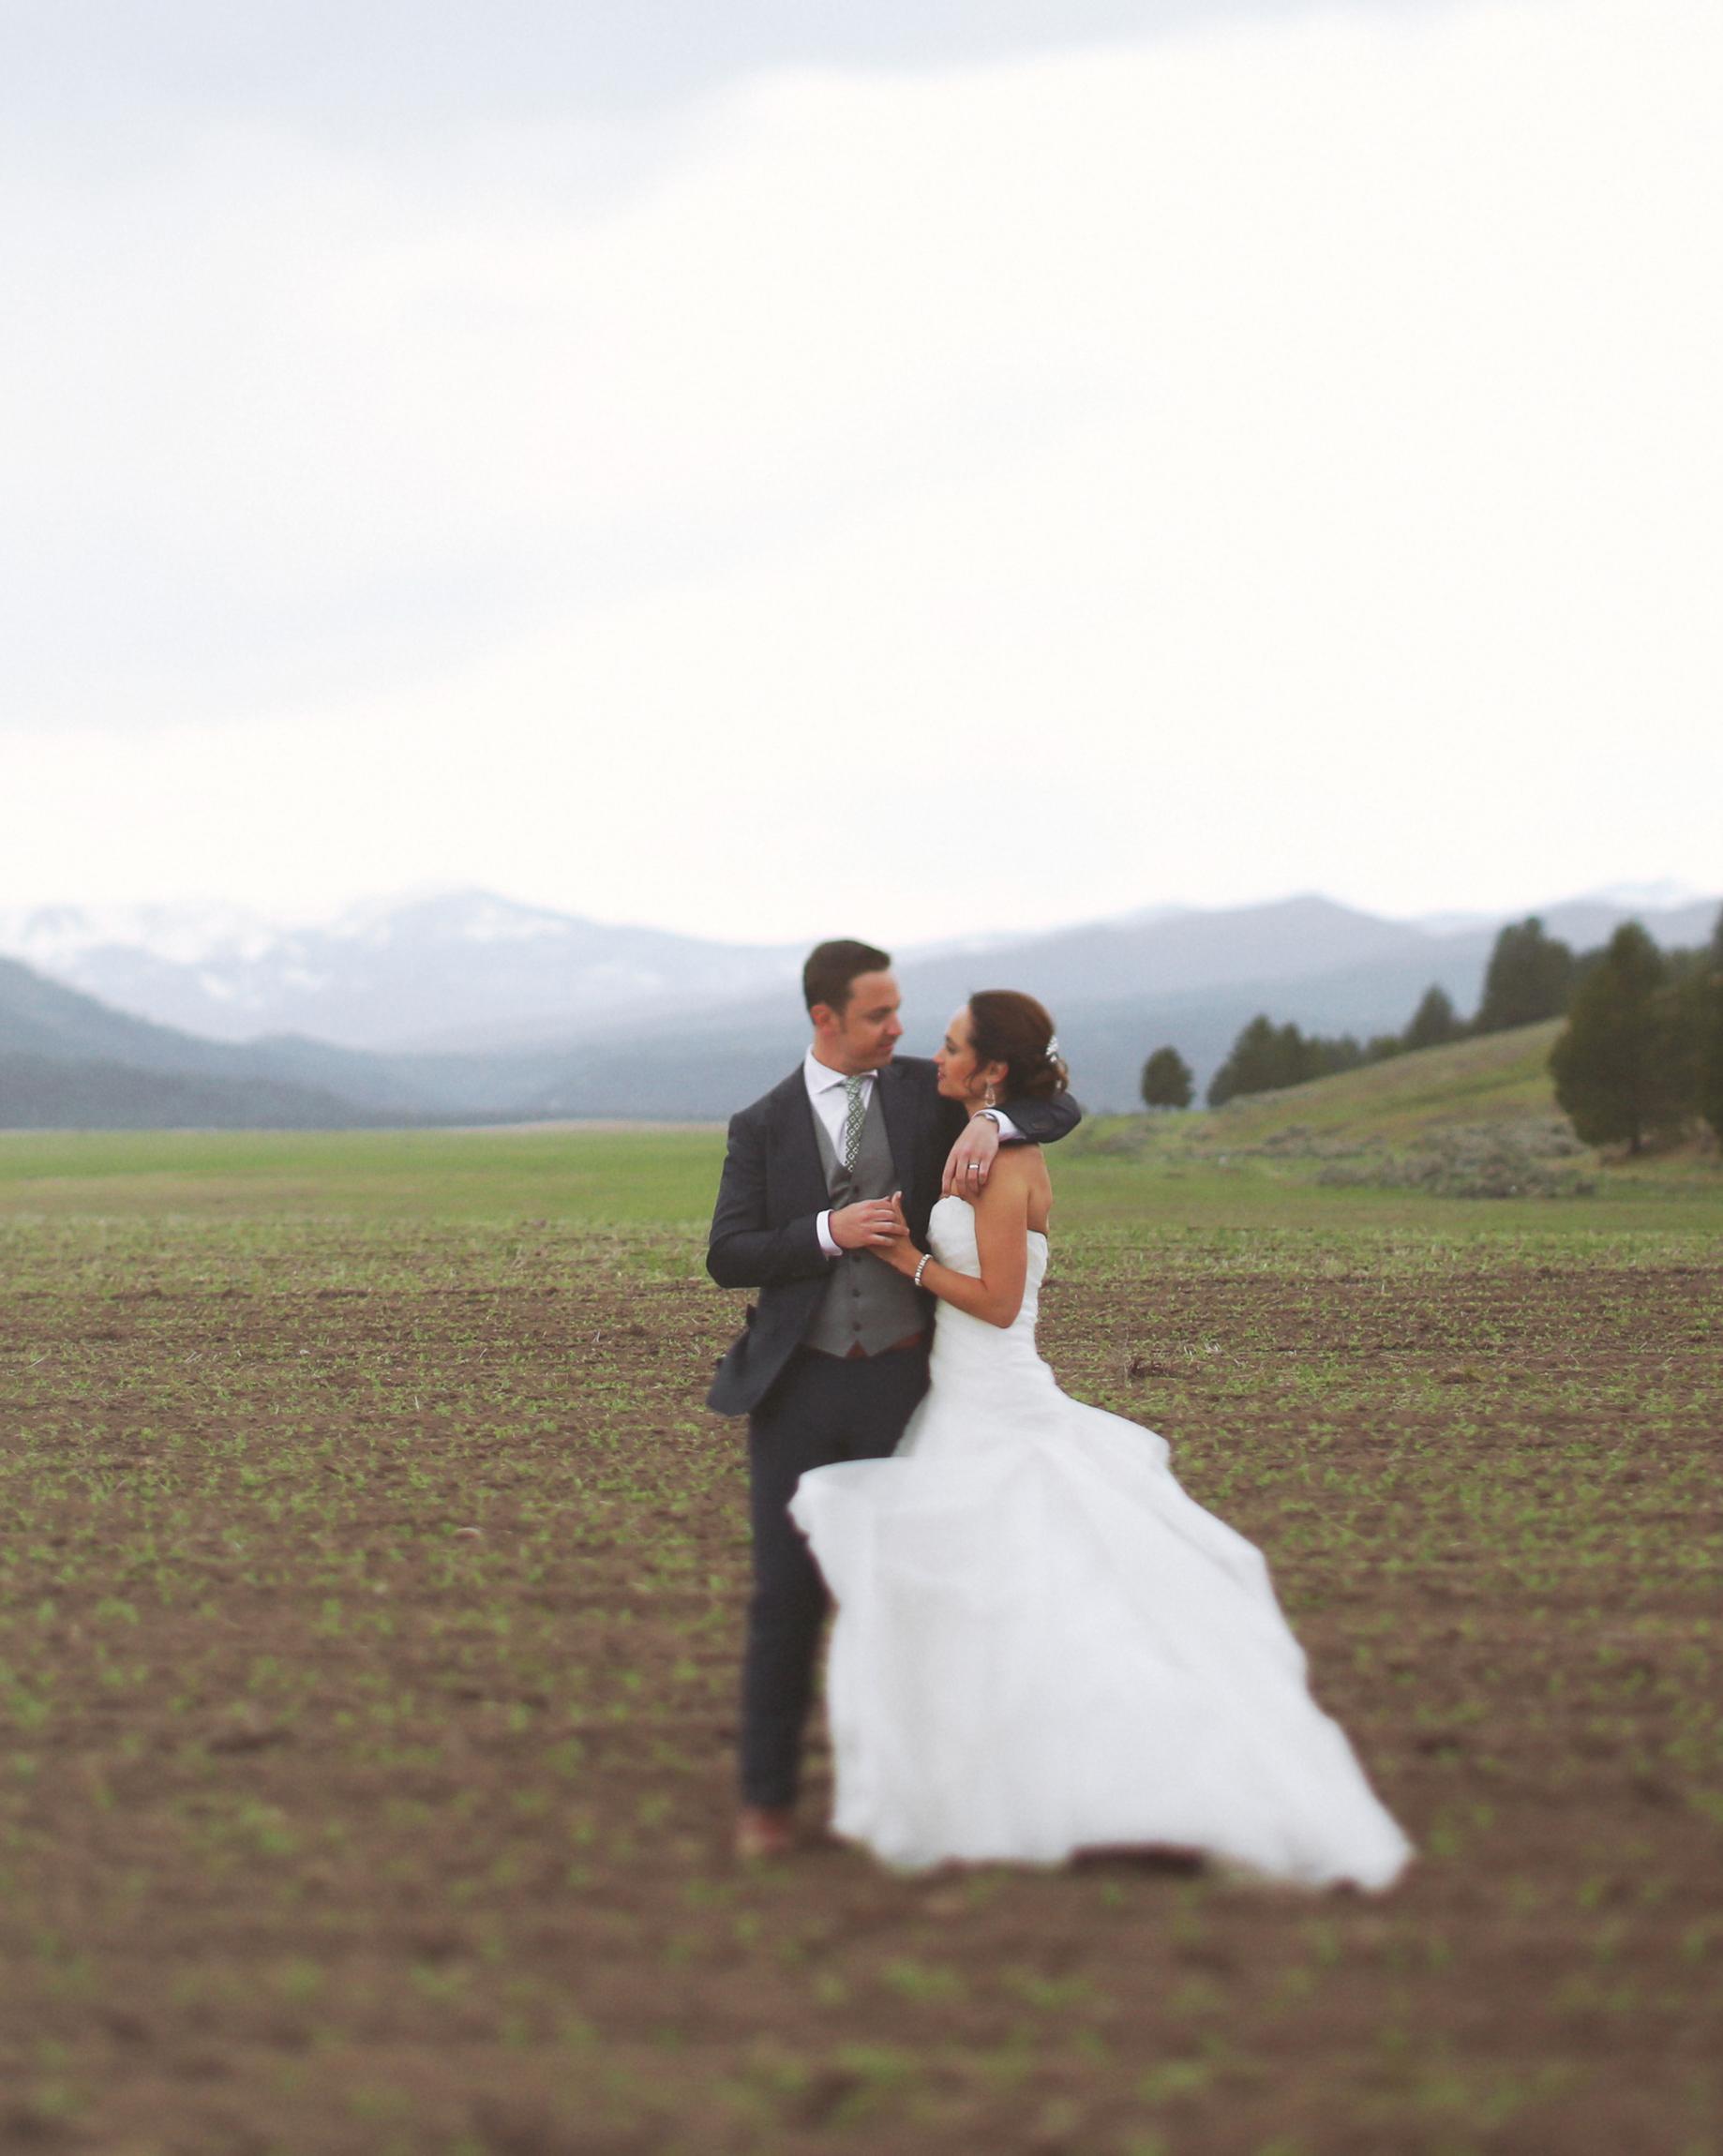 jamie-ryan-wedding-couple-090-s111523-0914.jpg